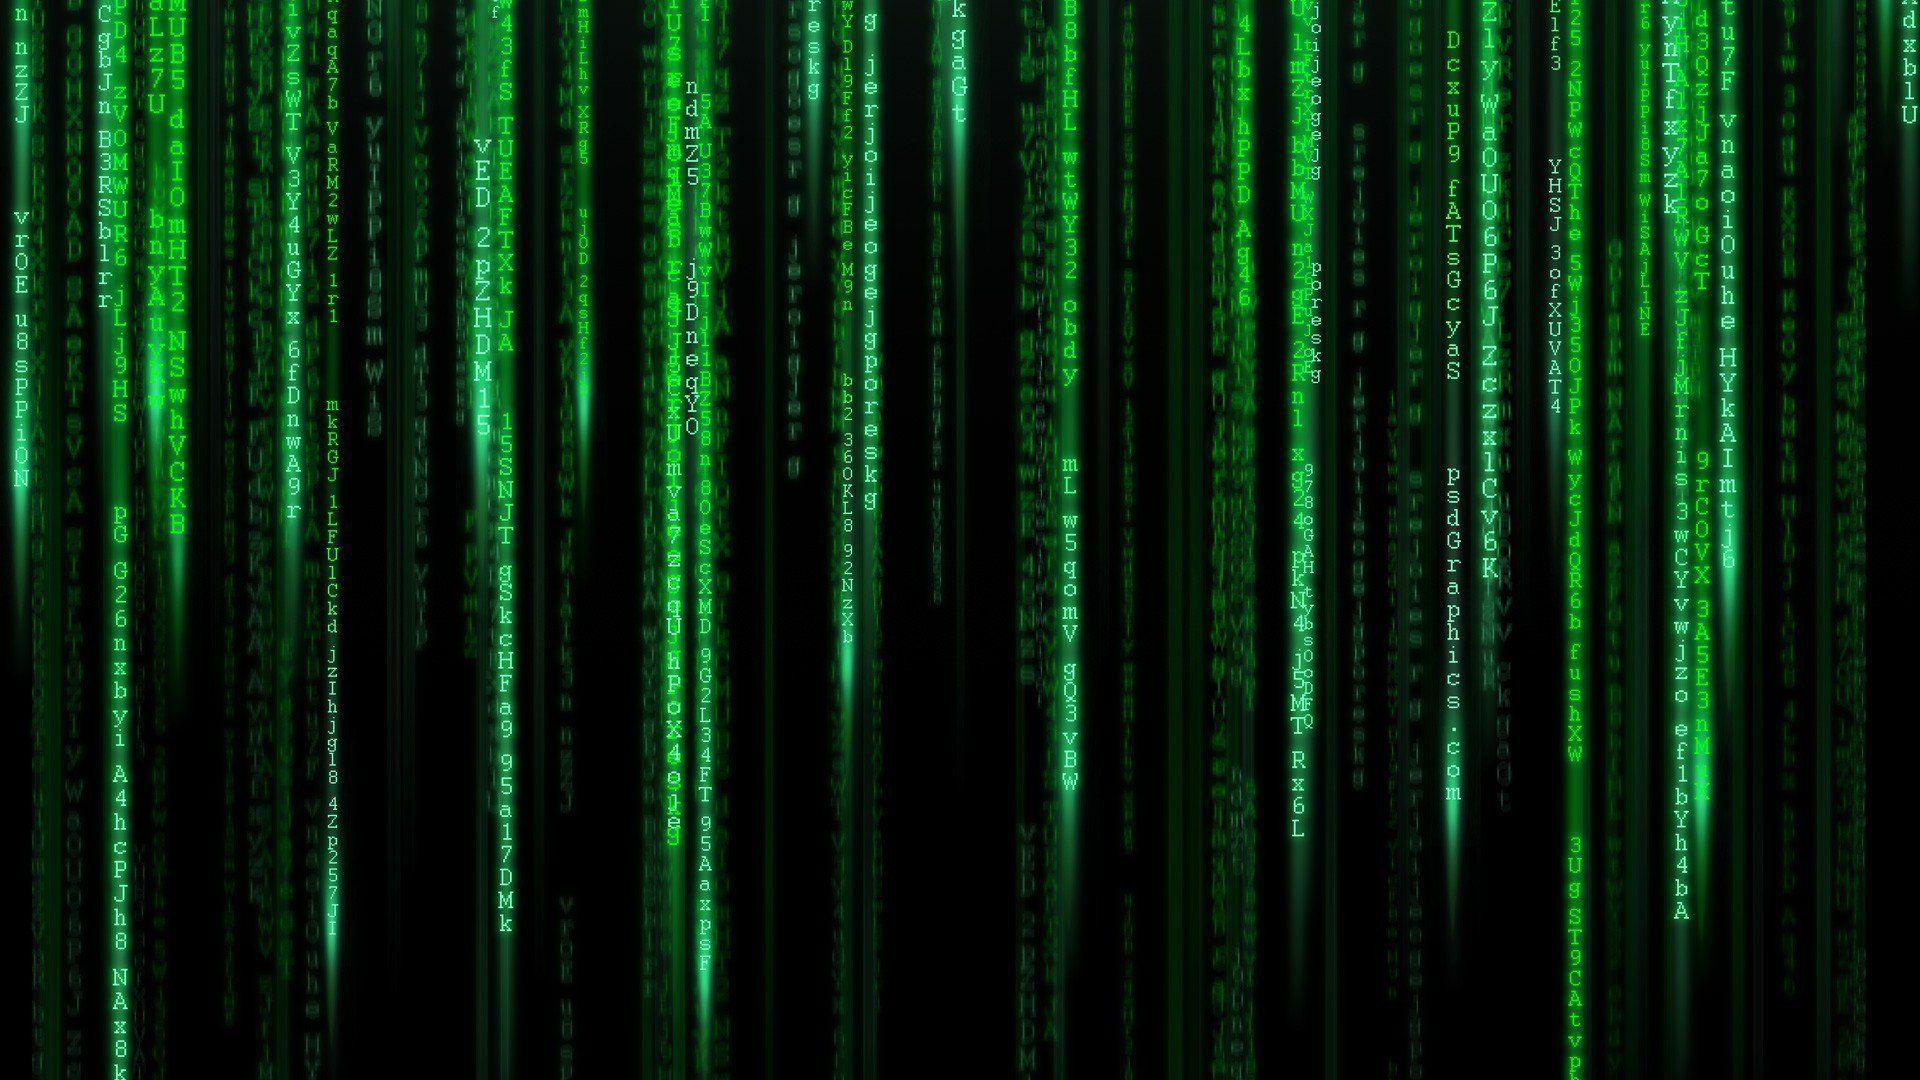 Coding desktop image